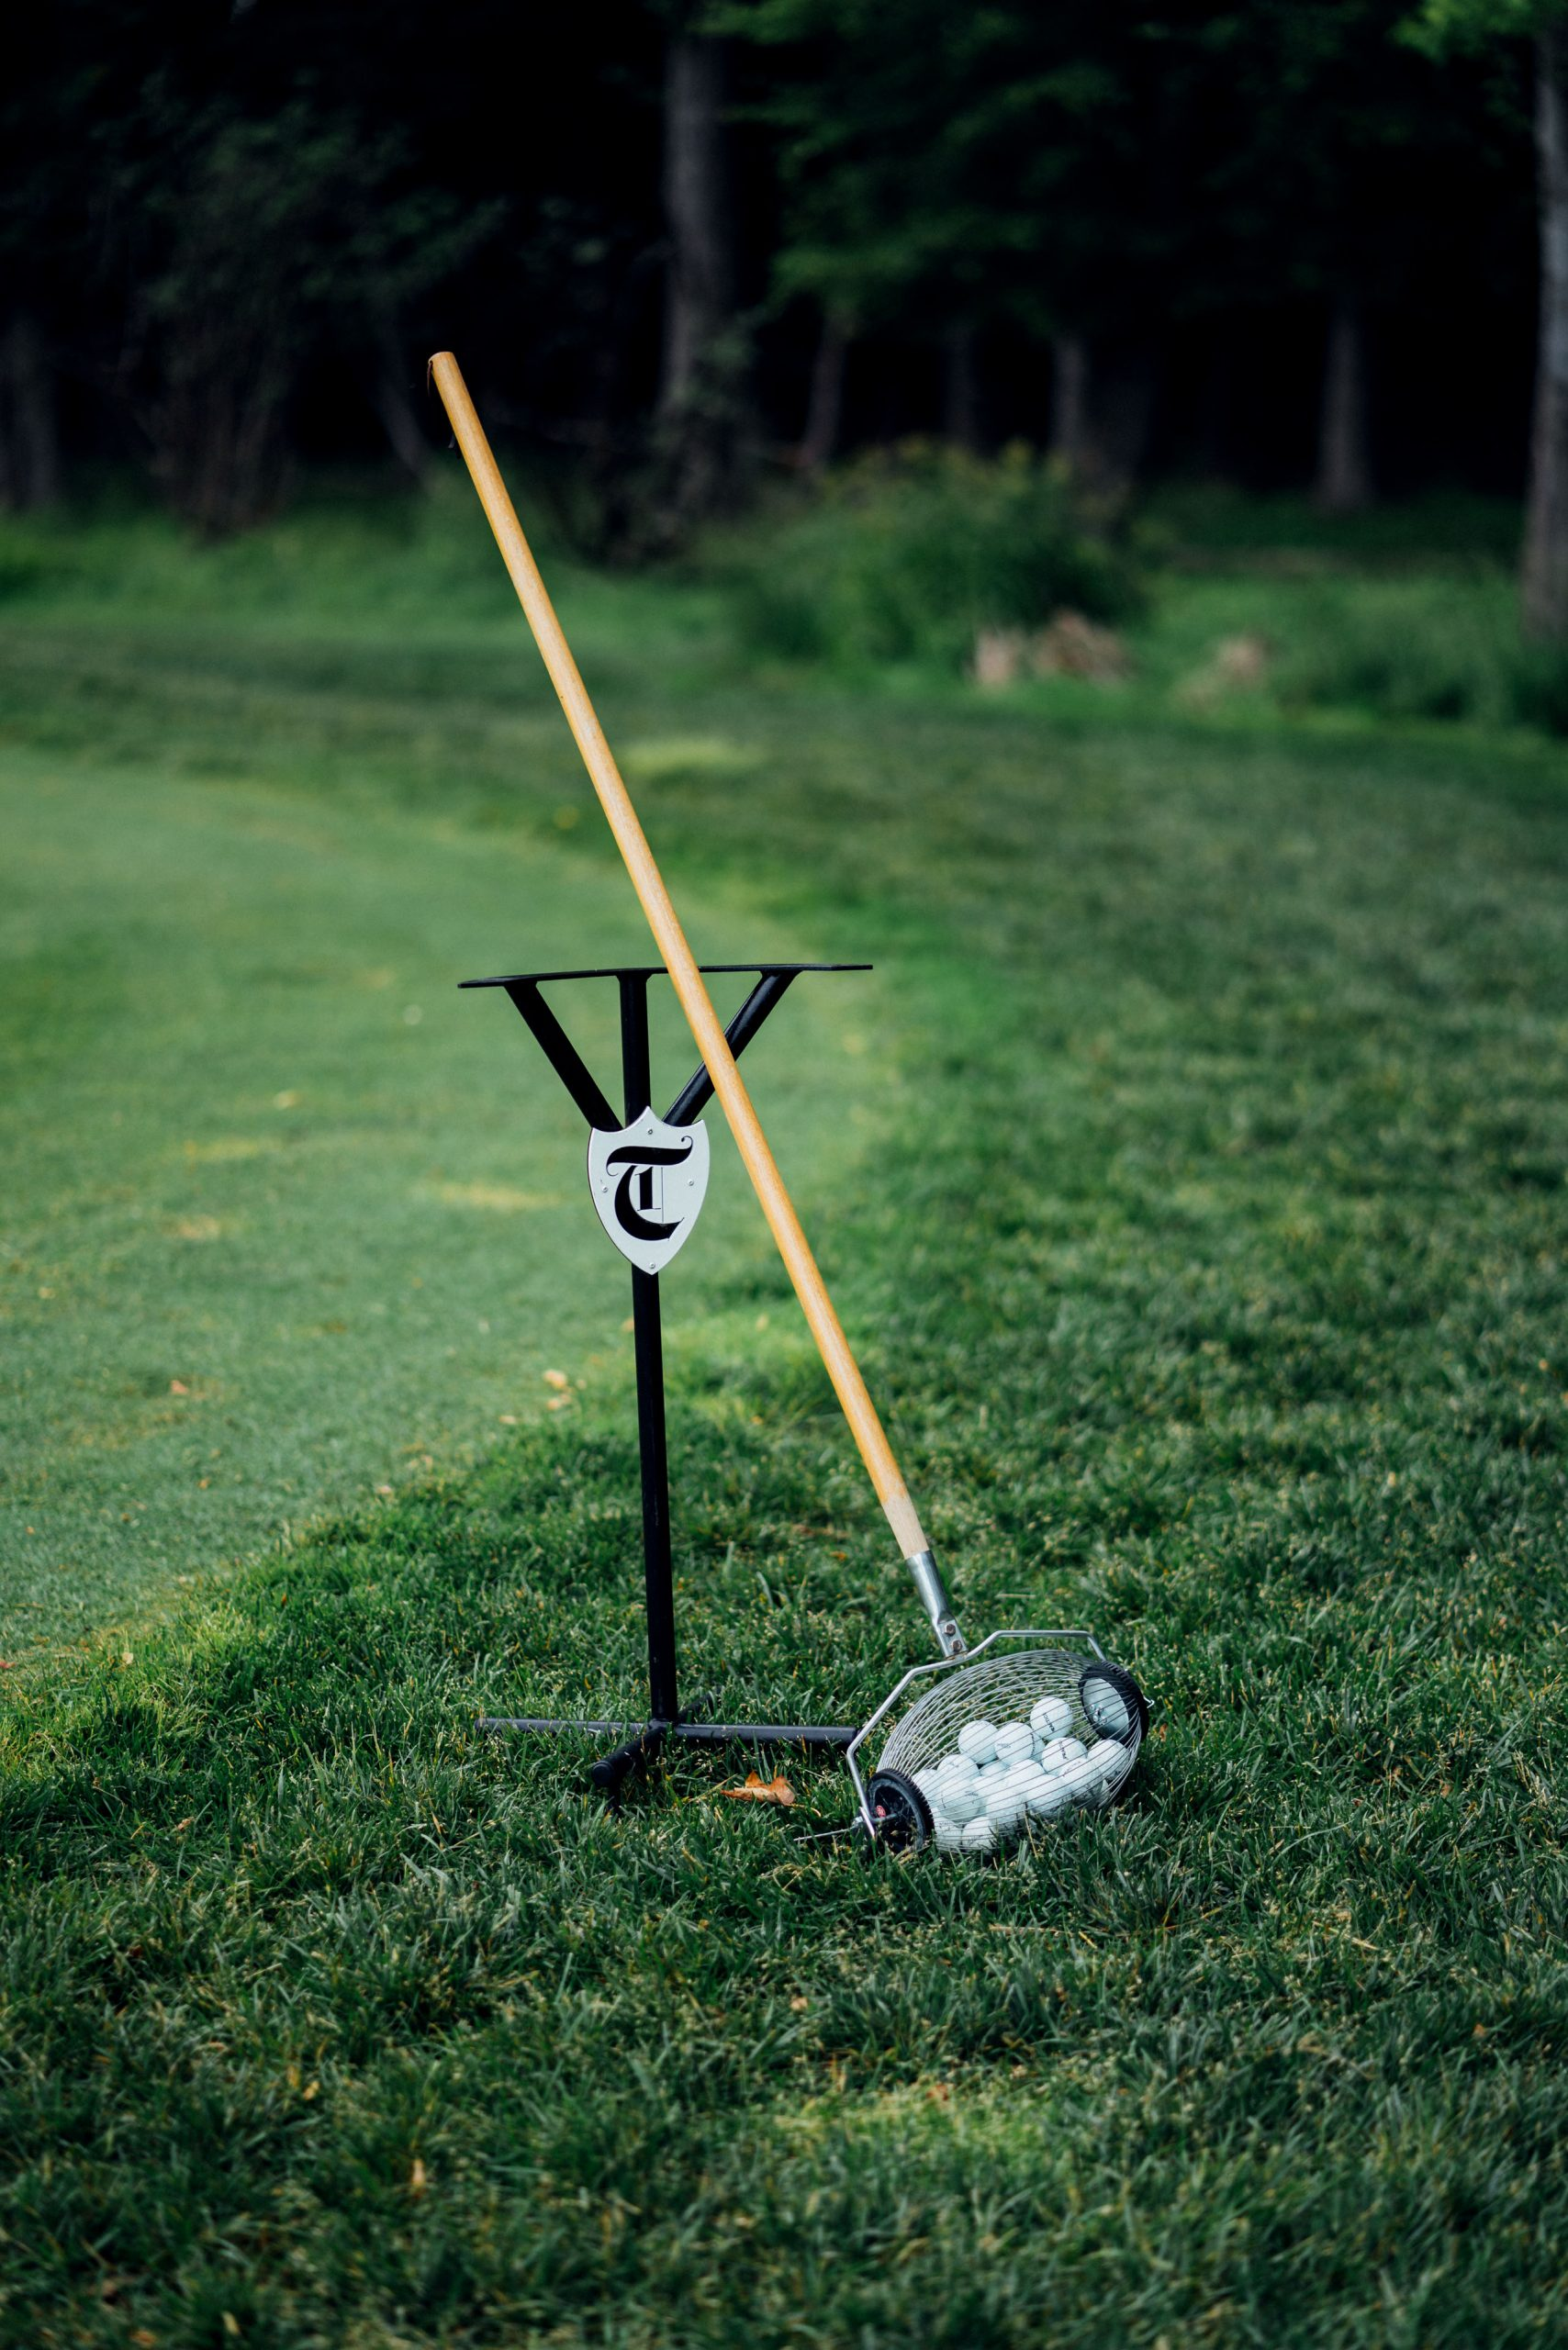 Collection service at Philadelphia's Union League Golf Club